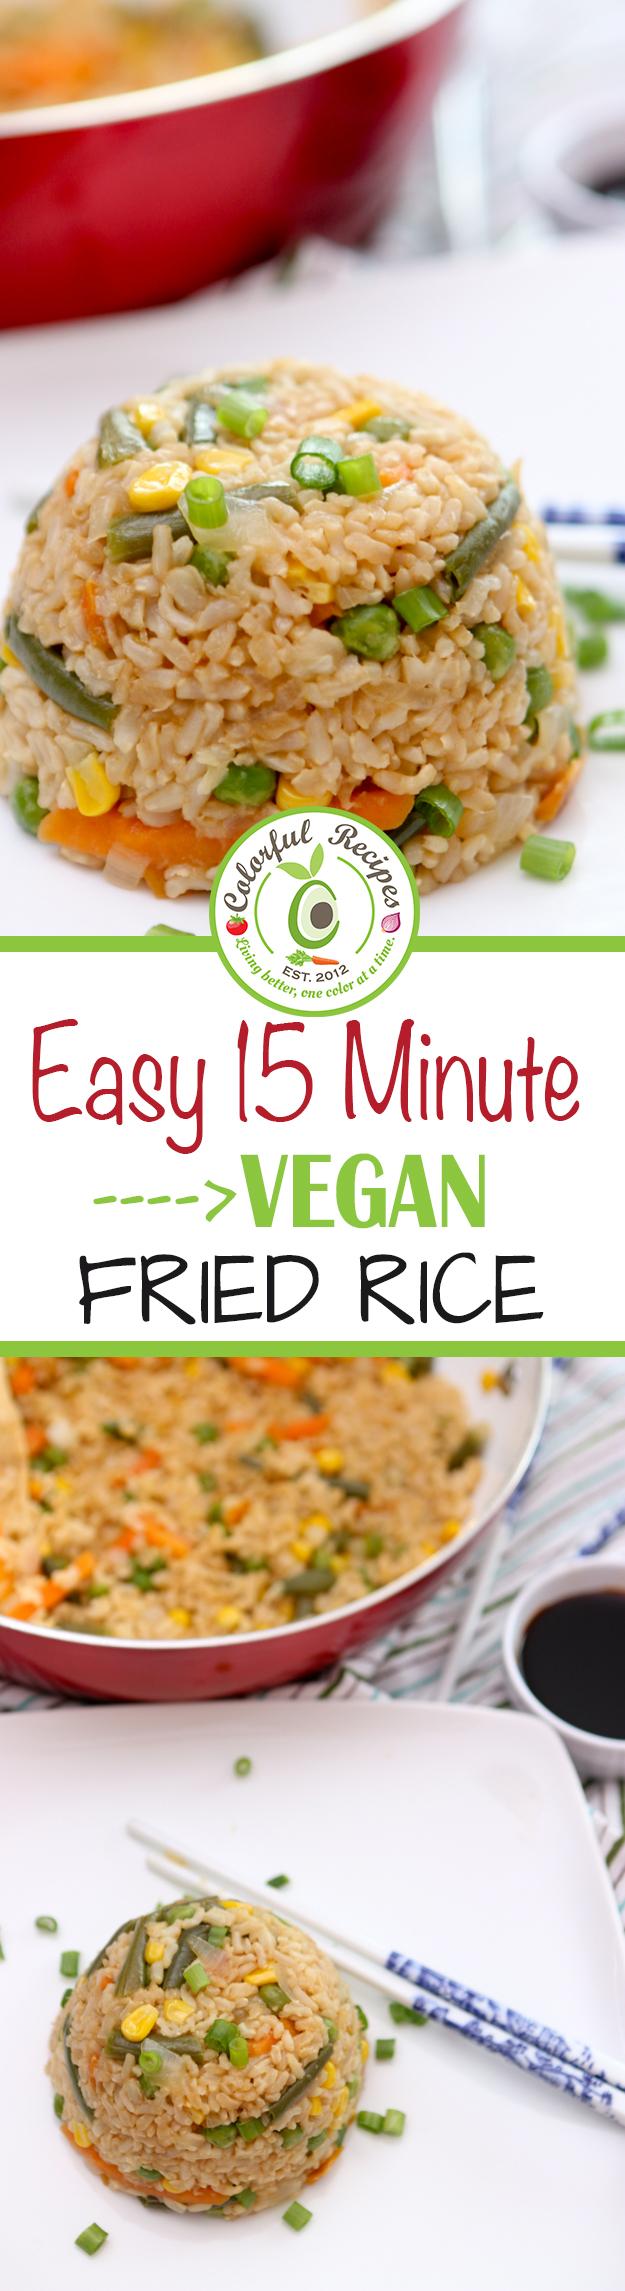 Easy 15 Minute Vegan Fried Brown Rice Pinterest